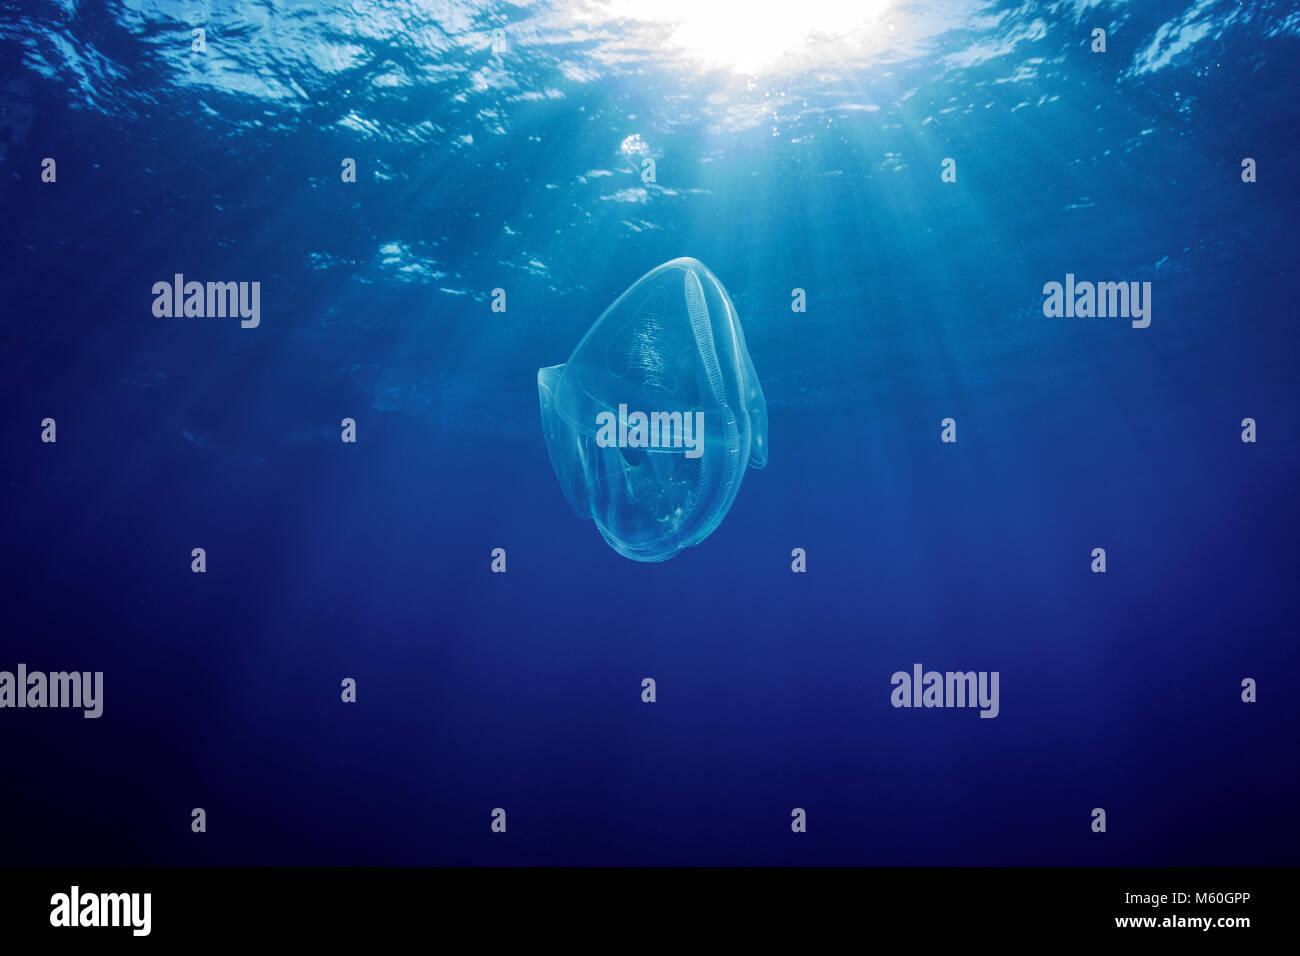 Comb Jelly drifting in open sea, Ctenophora, Roca Partida, Revillagigedo Islands, Mexico - Stock Image